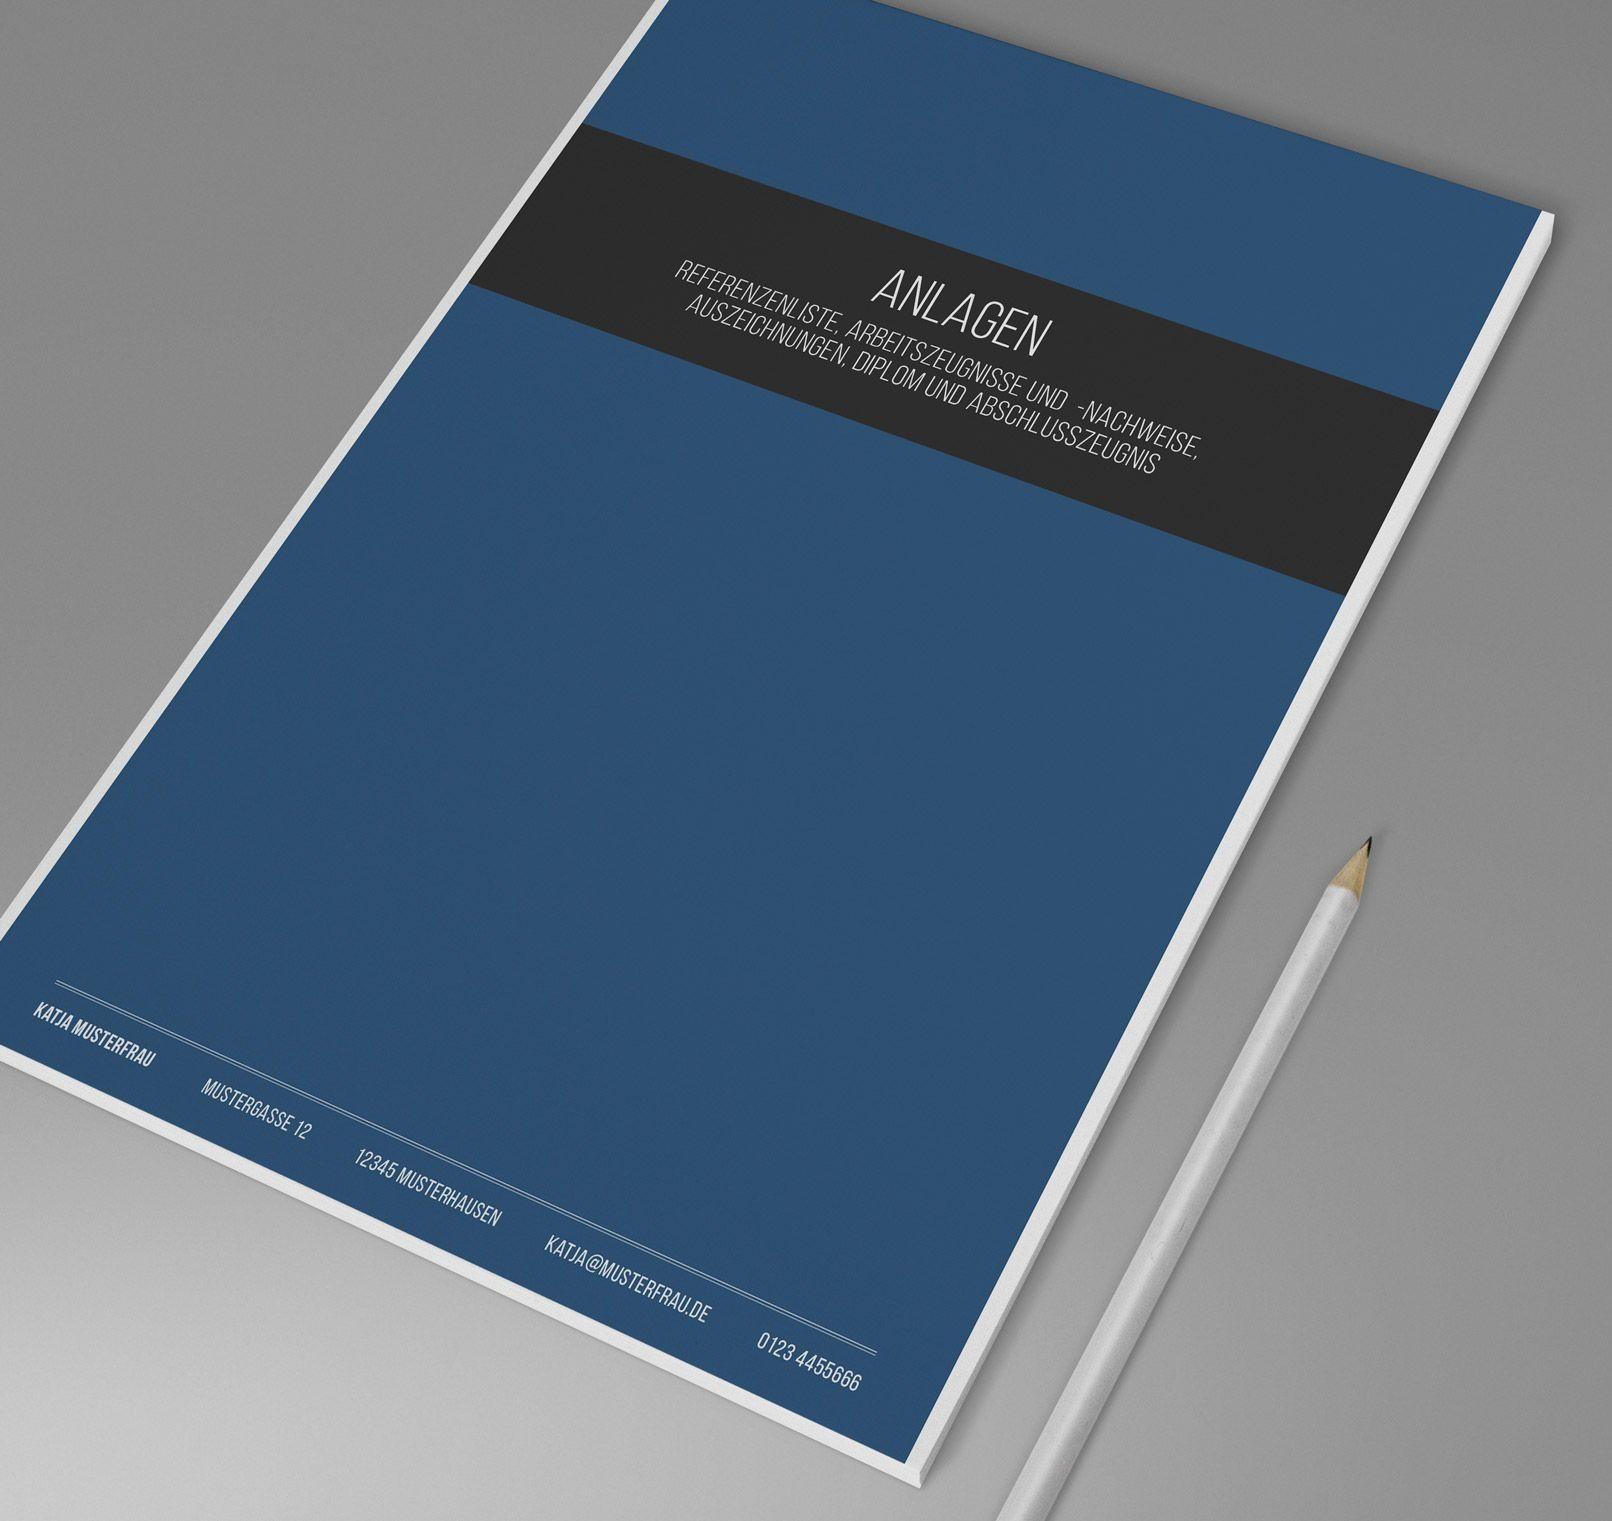 Bewerbung Als Burokauffrau Burokaufmann Design Muster Download Bewerbung Als Burokauffrau Kauffrau Bewerbung Lebenslauf